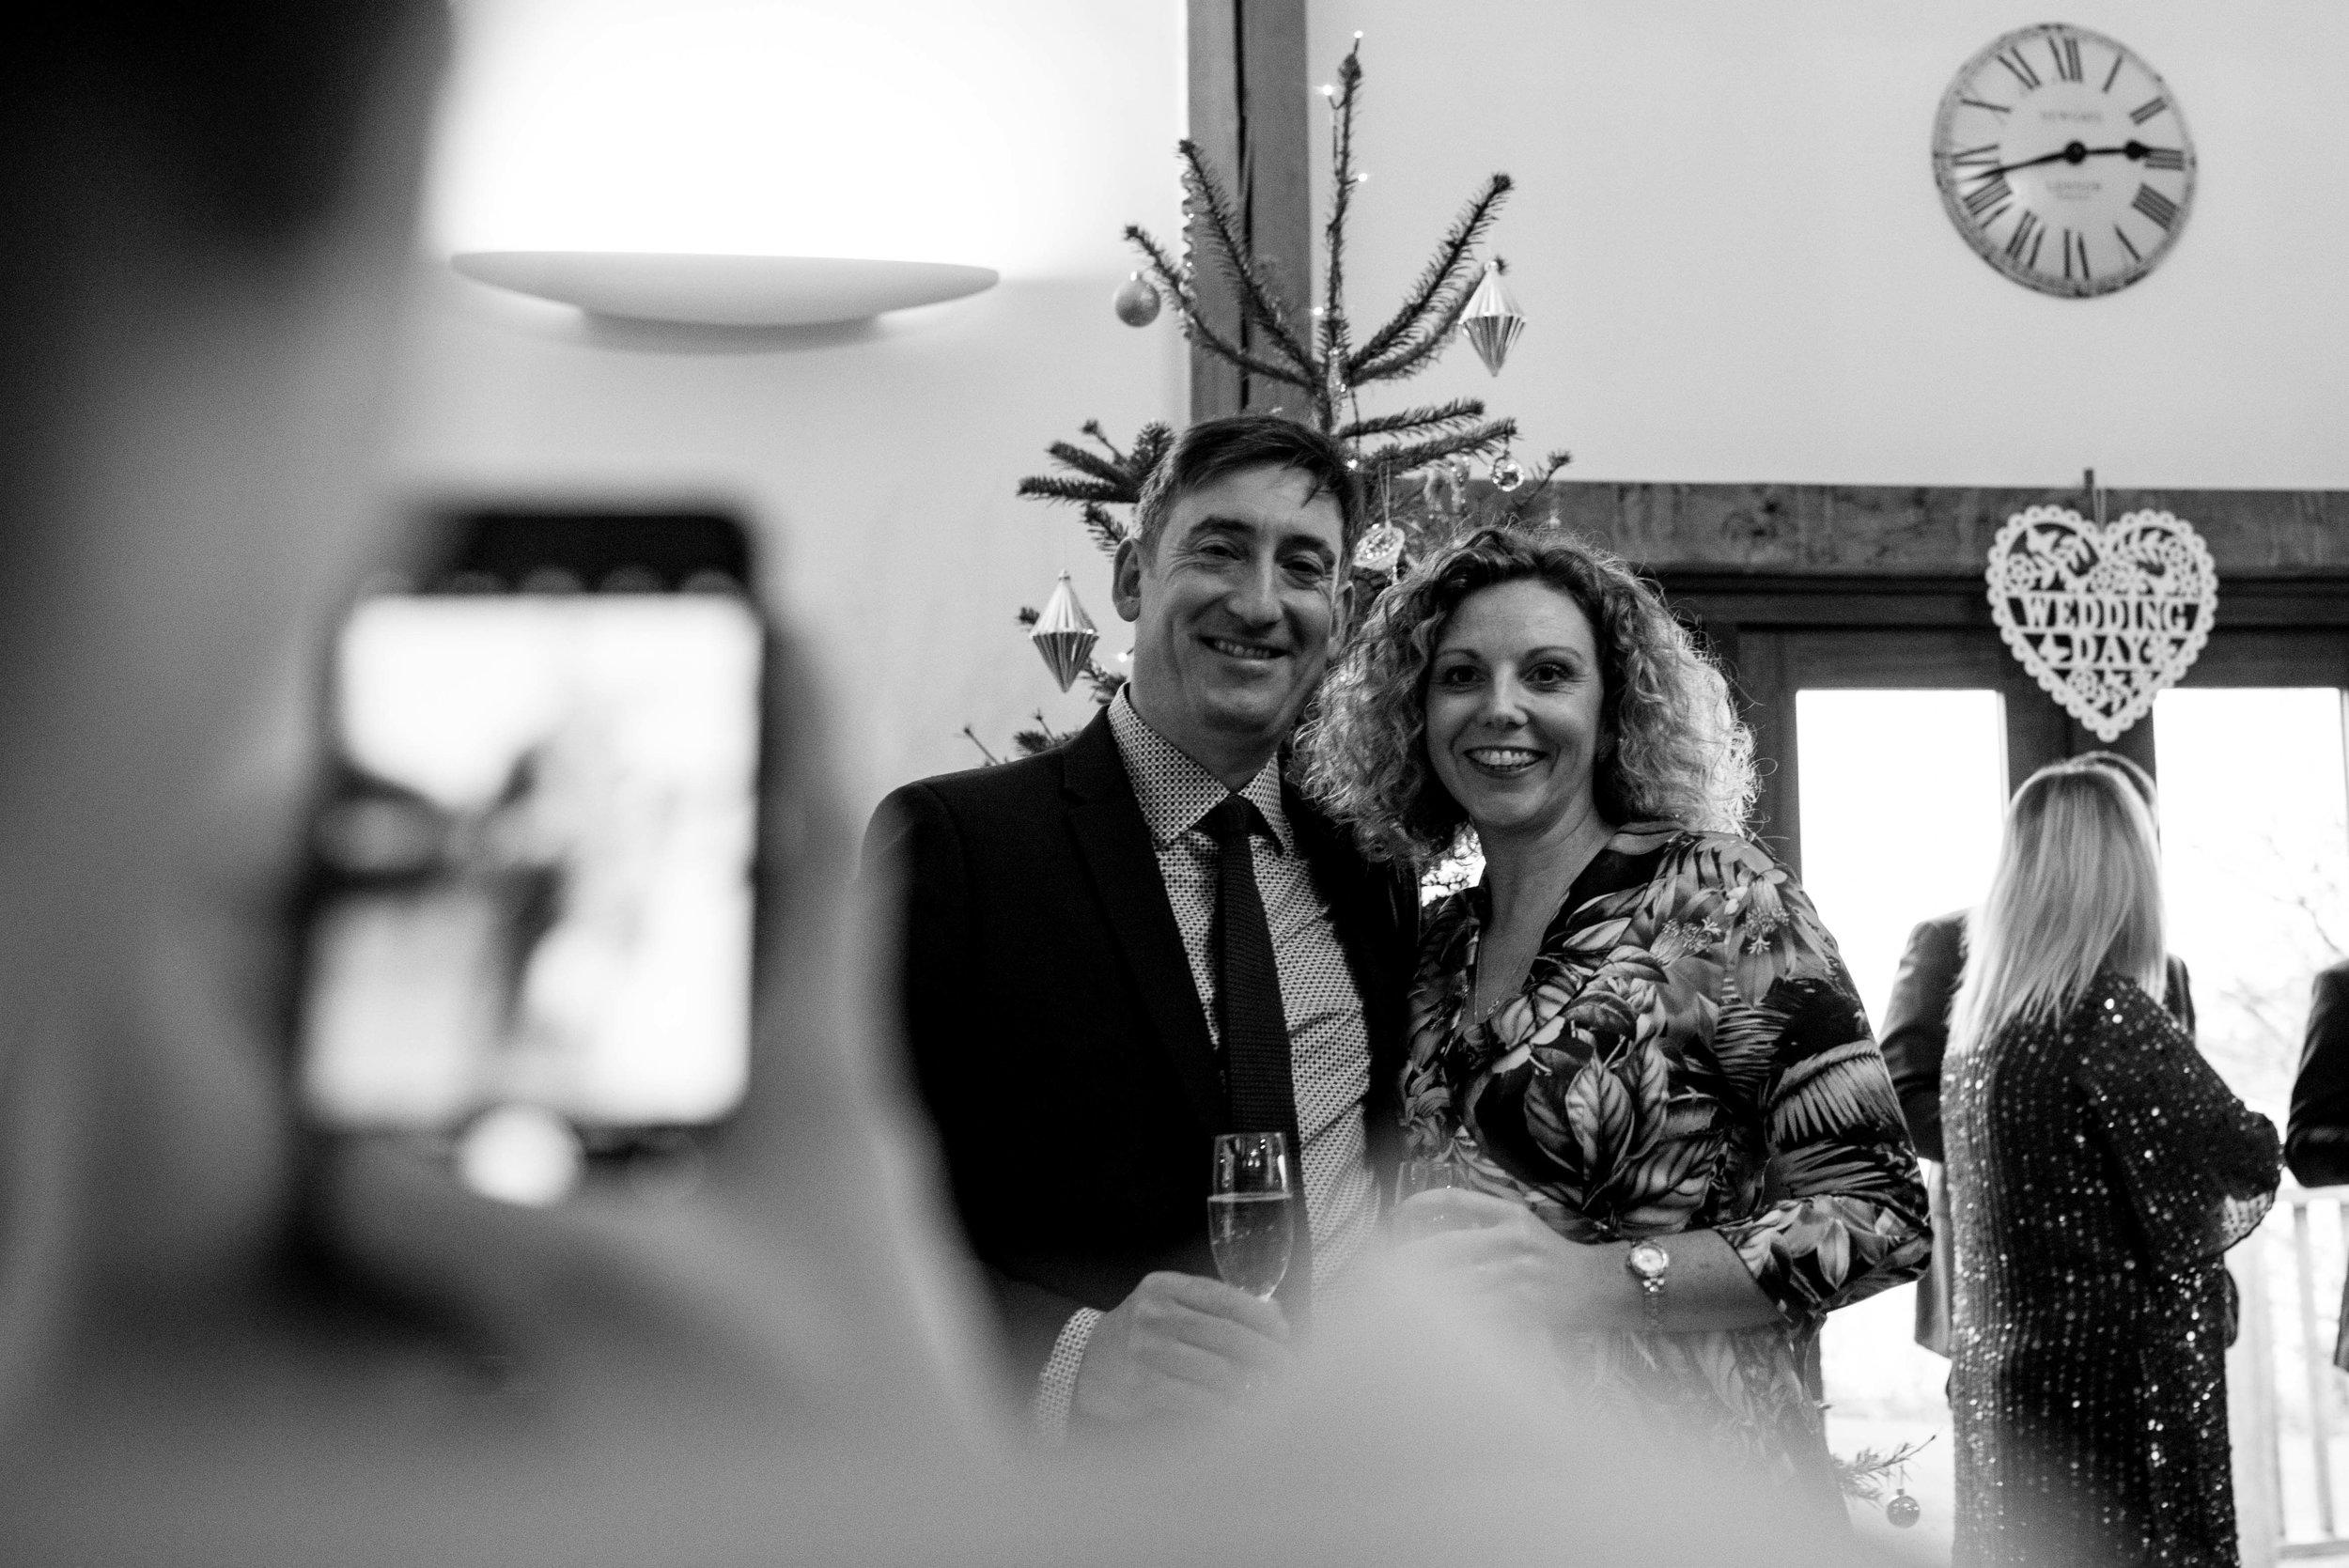 Cheshire Wedding photography at Sandhole Oak Barn